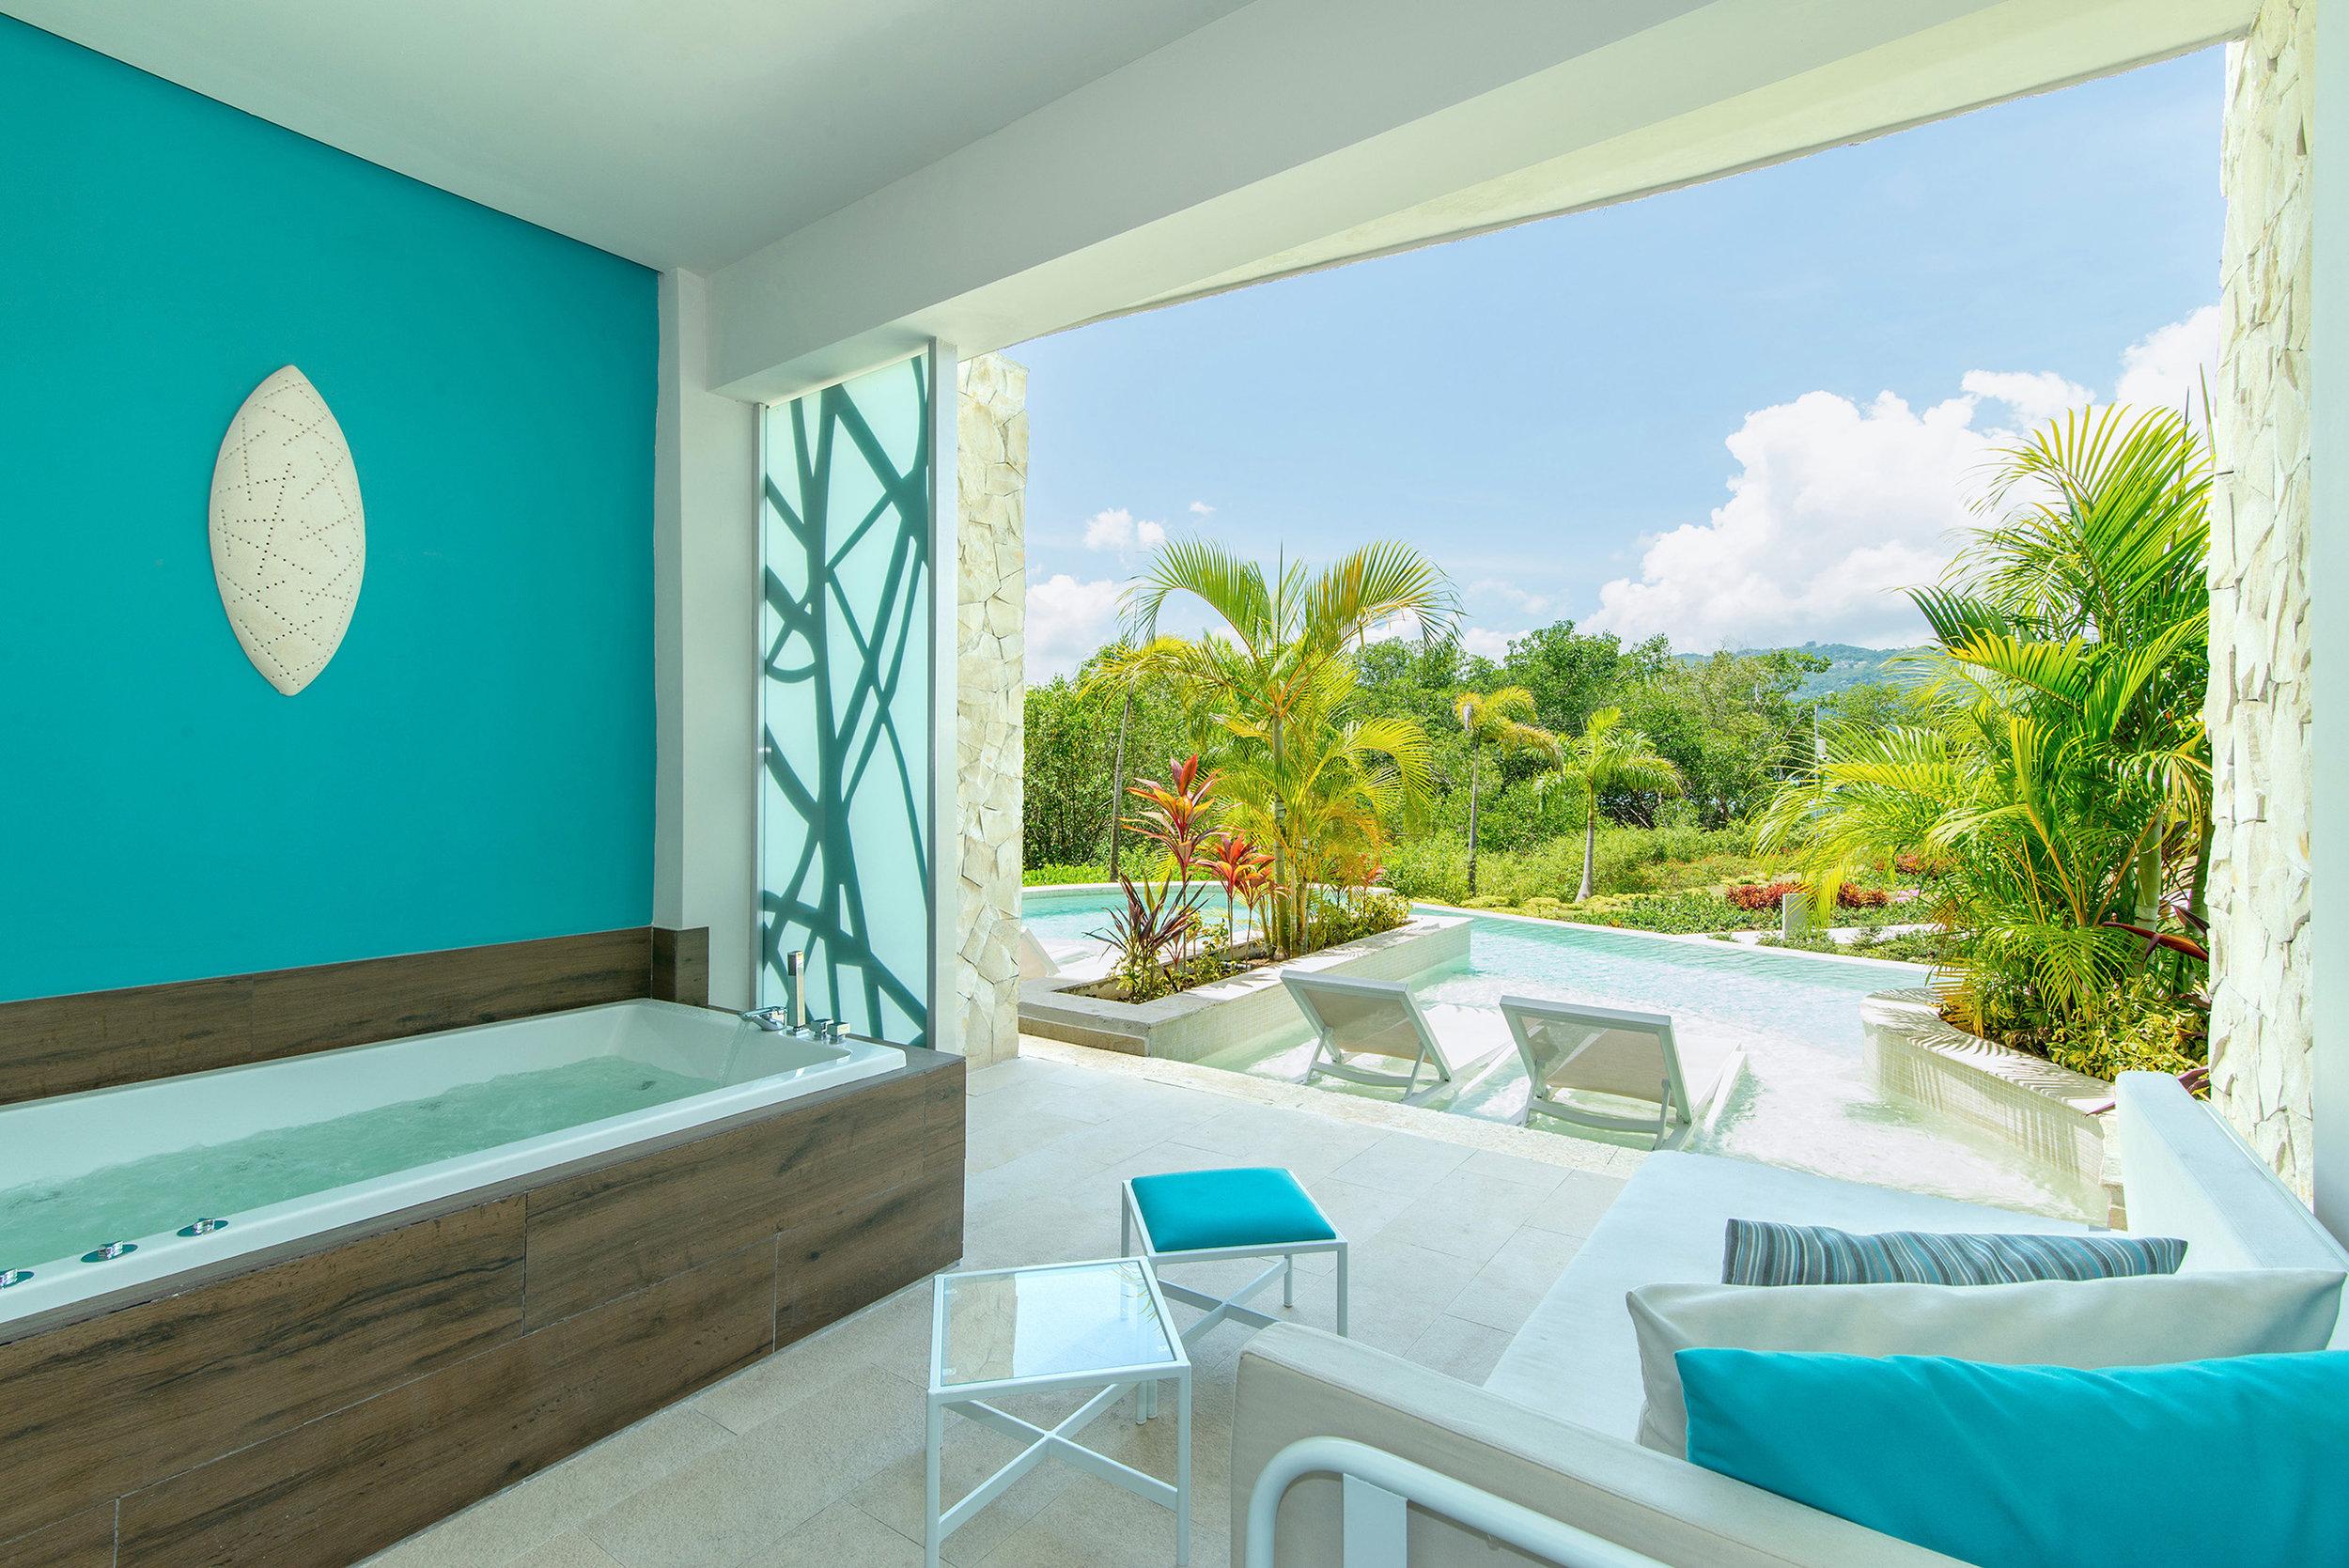 BREMB_xhale_club_Junior_Suite_Swim-Up_balcony_NL.jpg